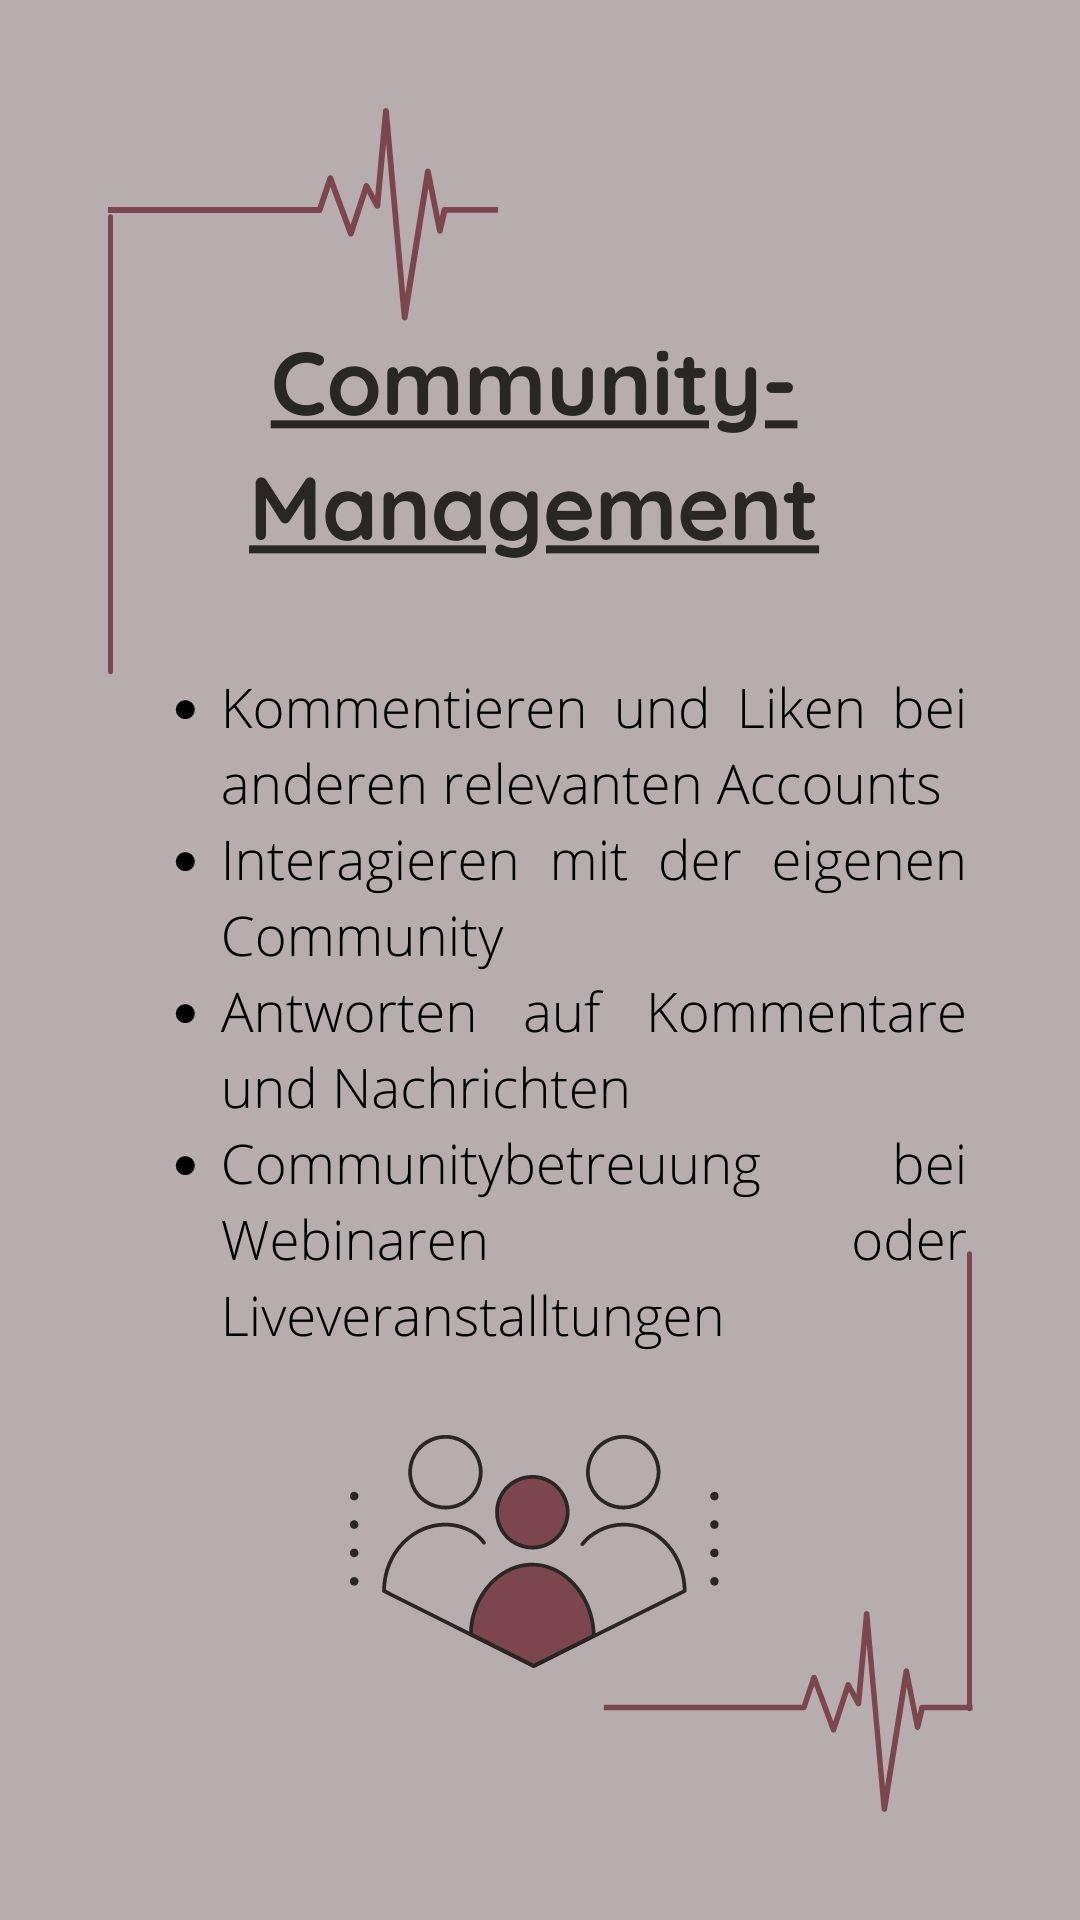 Communitymanagement kristin